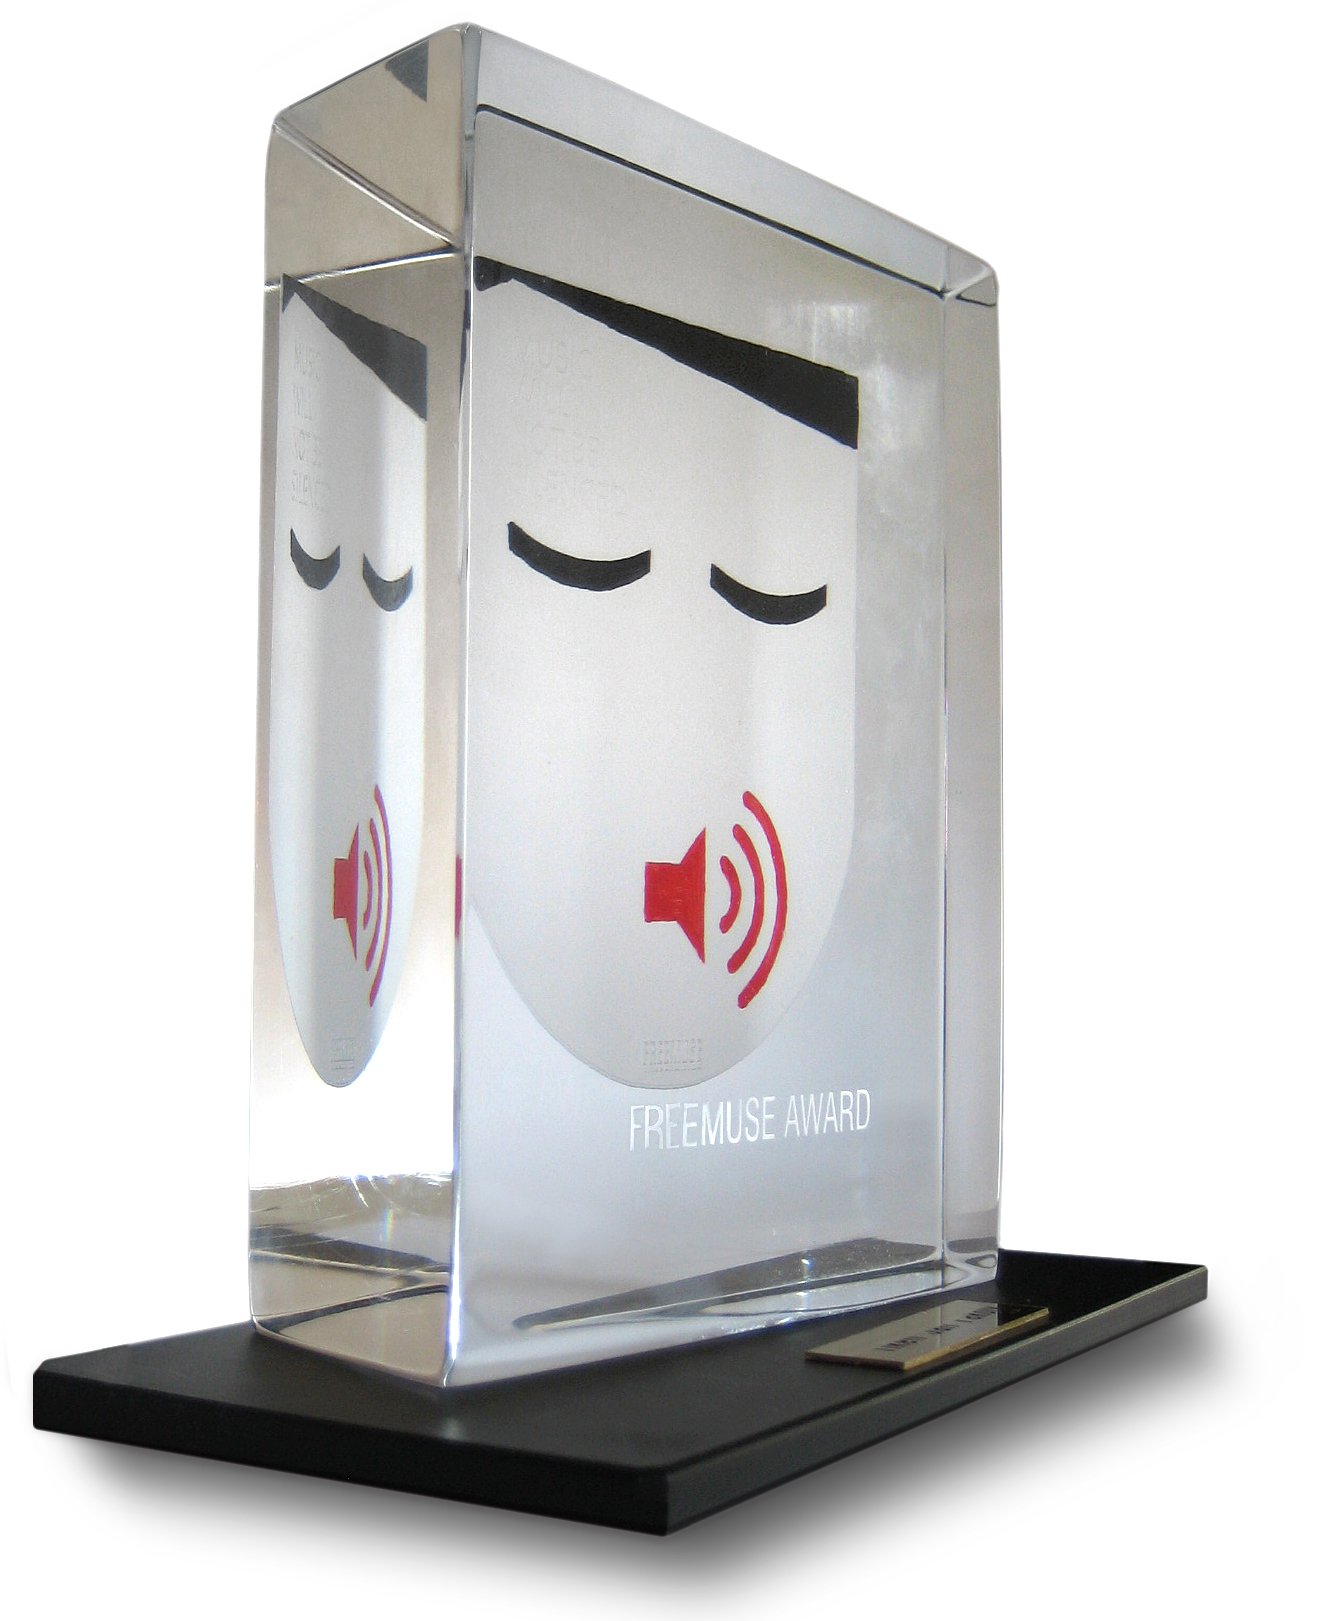 Freemuse Award 2014